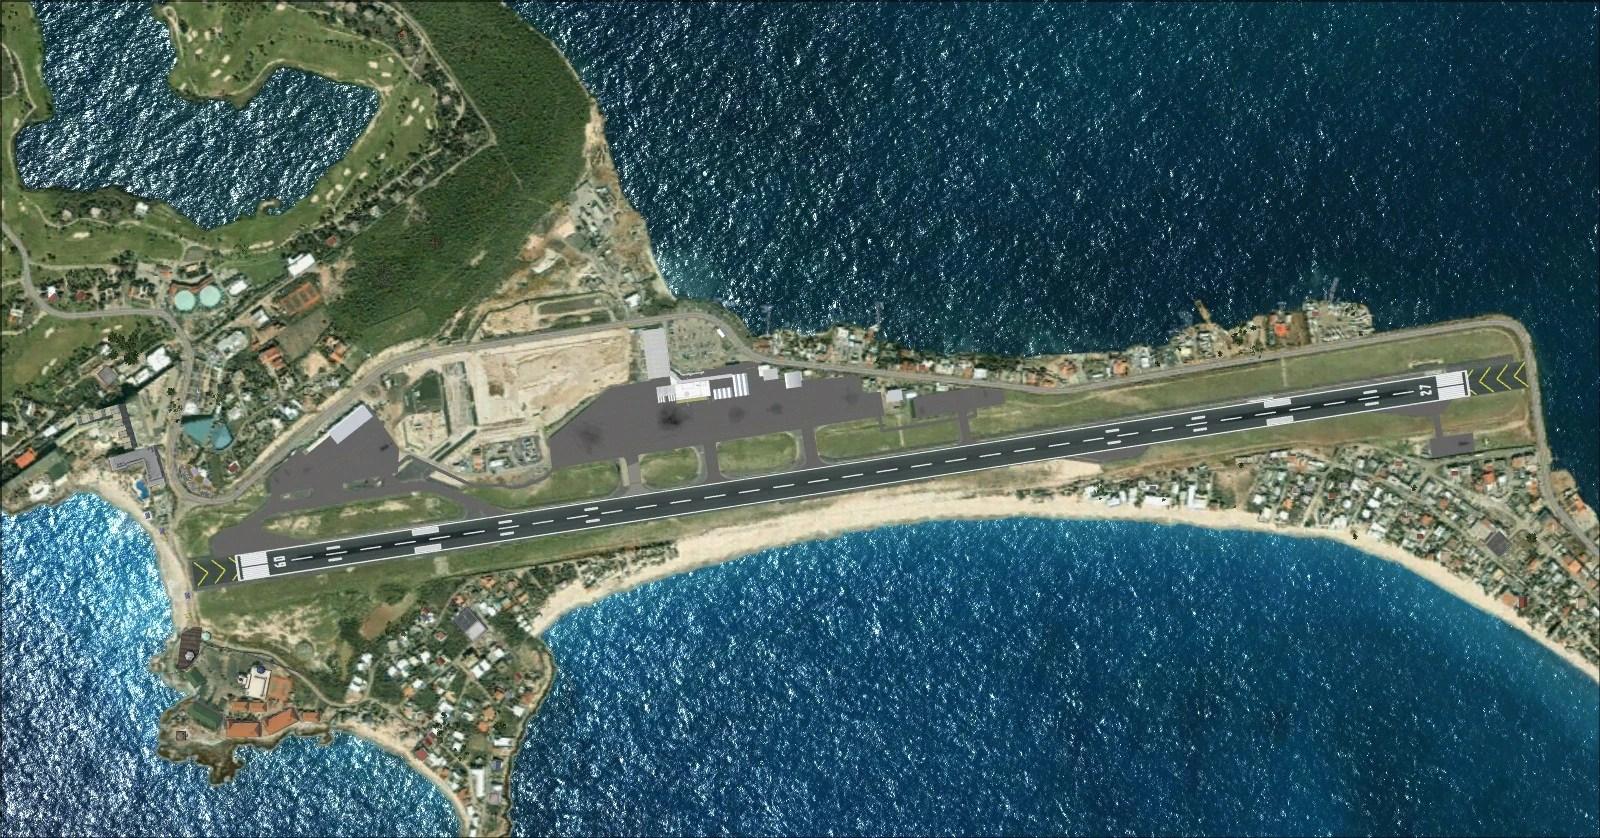 Princess Juliana International Airport | Microsoft Flight Simulator X Wiki | FANDOM powered by Wikia